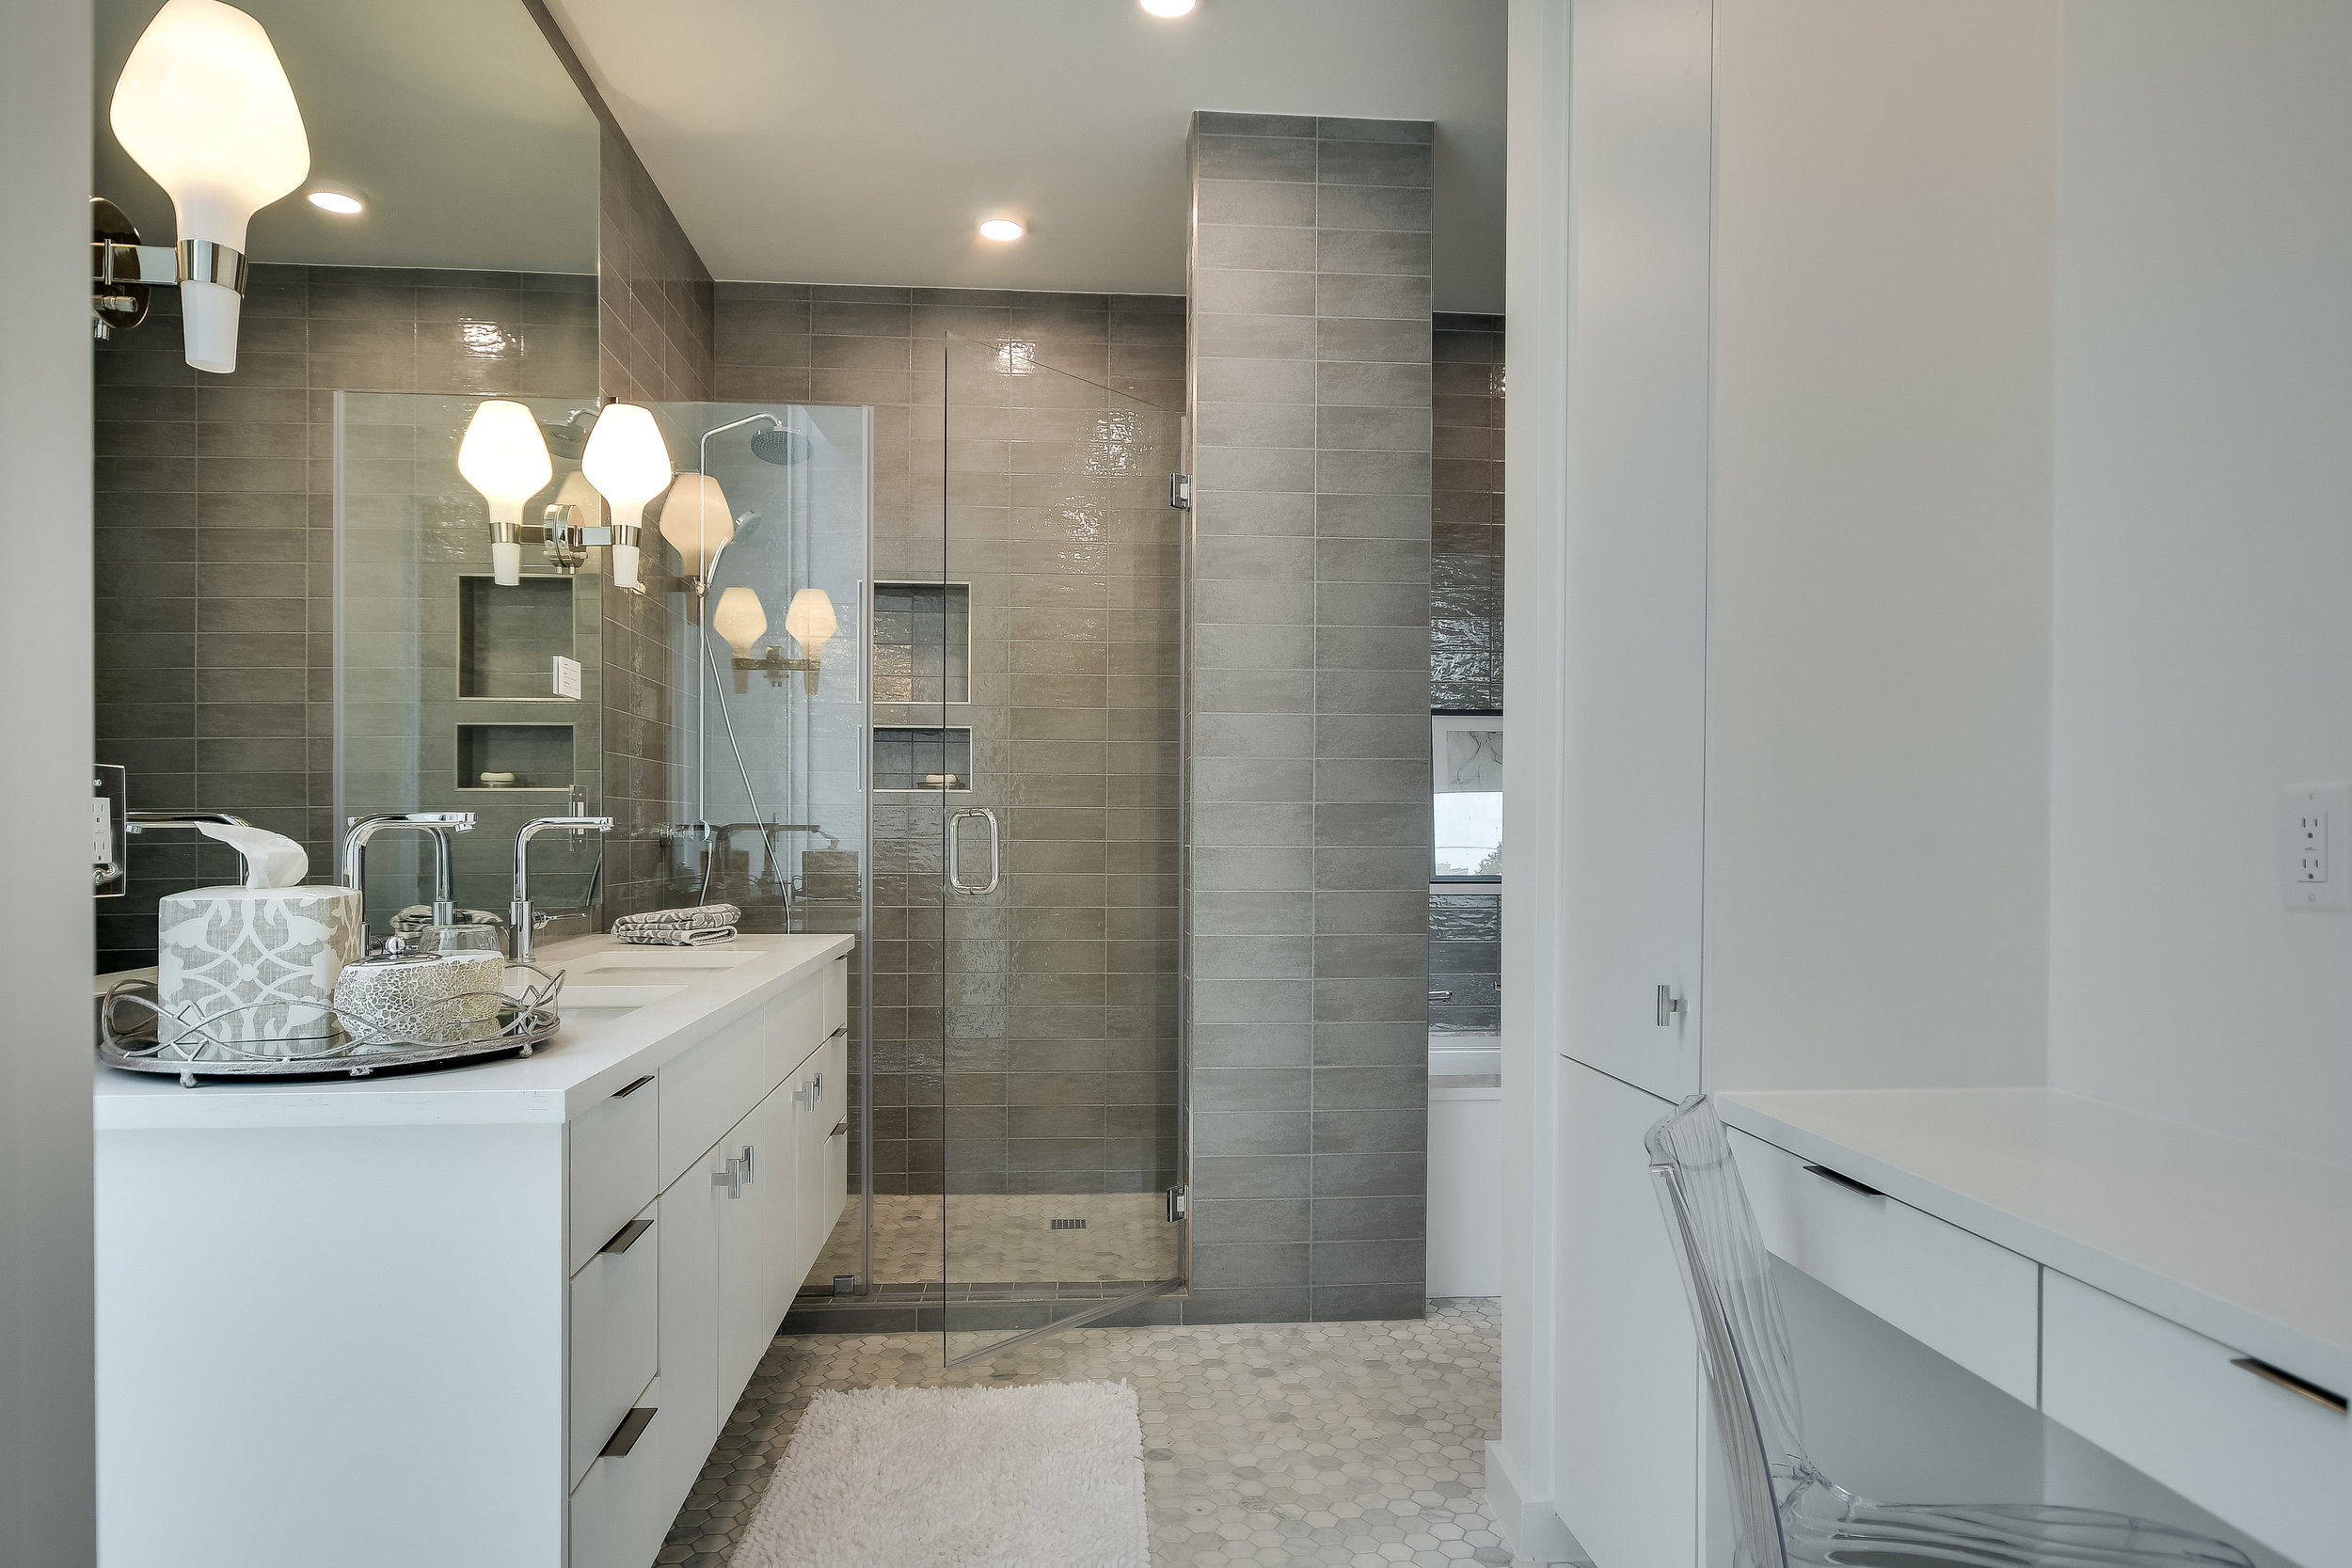 027_Master Bathroom .jpg